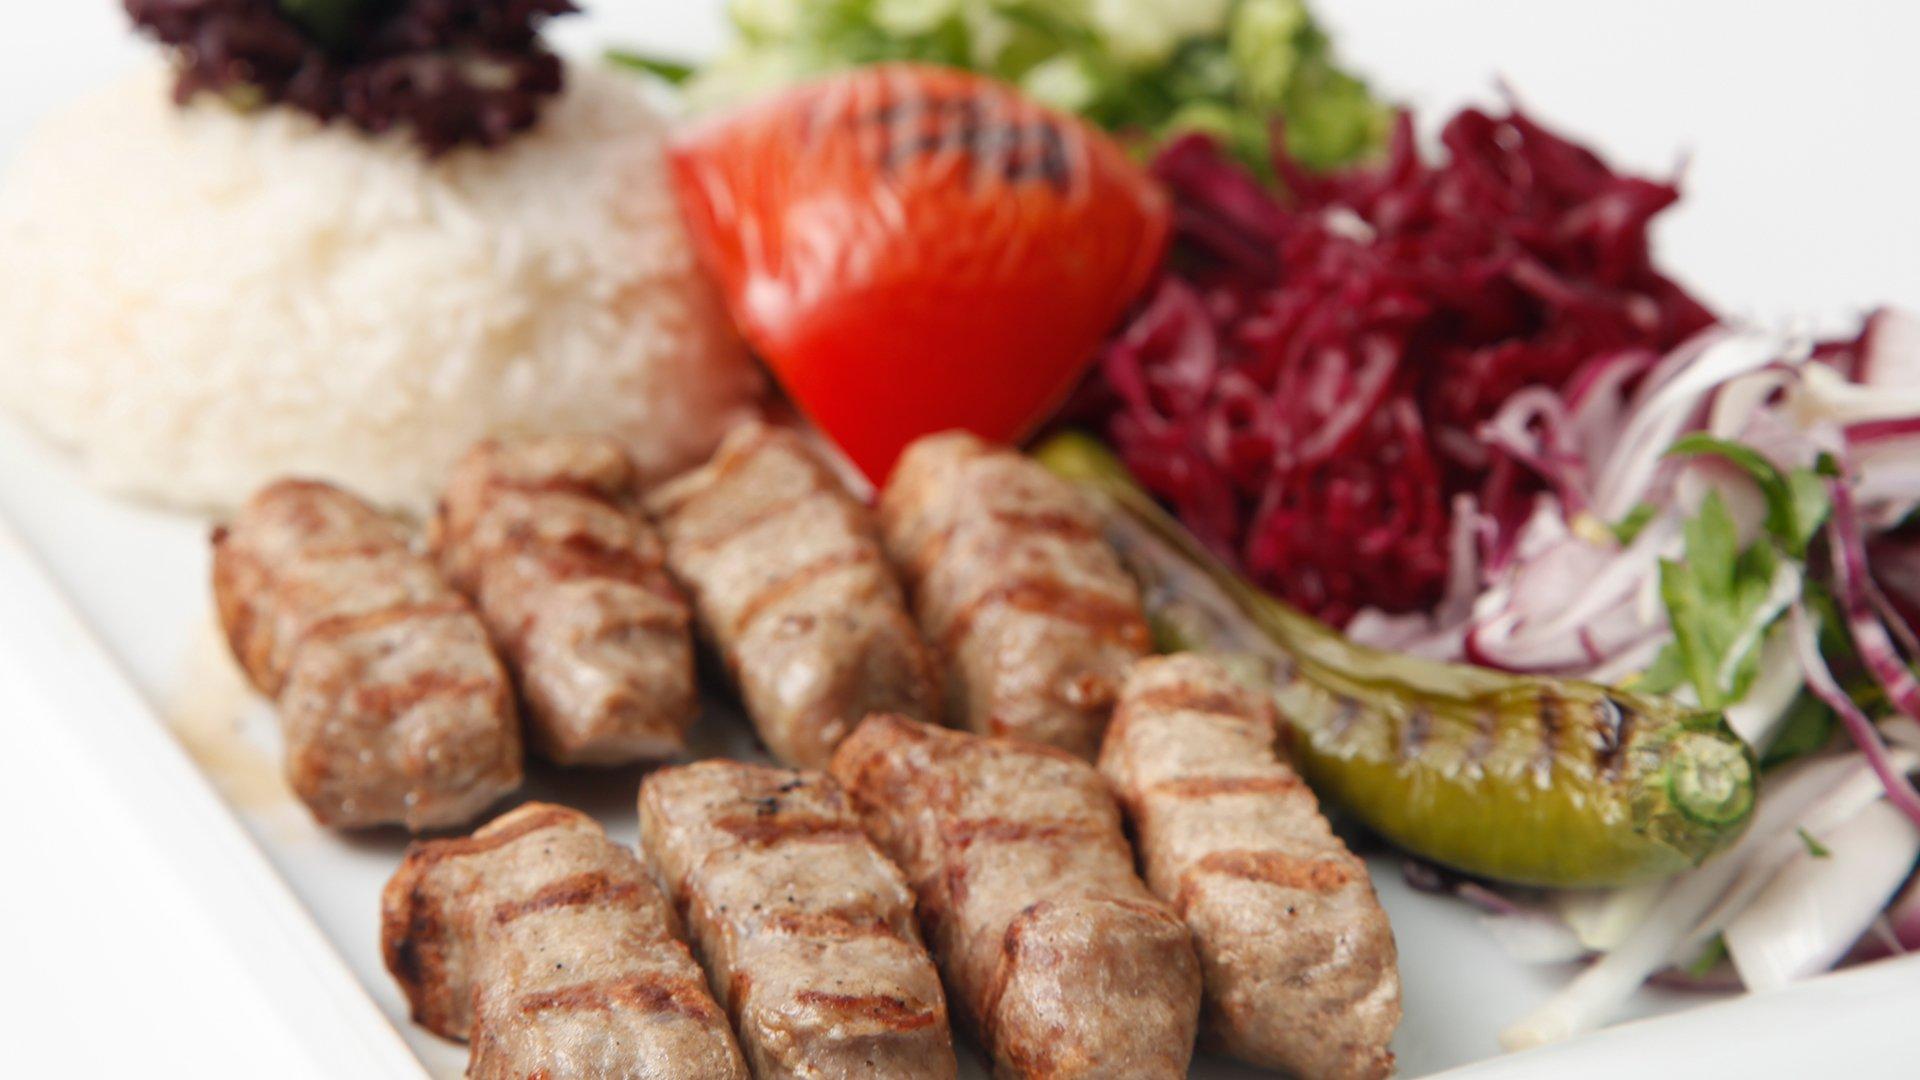 bursa-yemekleri-inegol-kofte